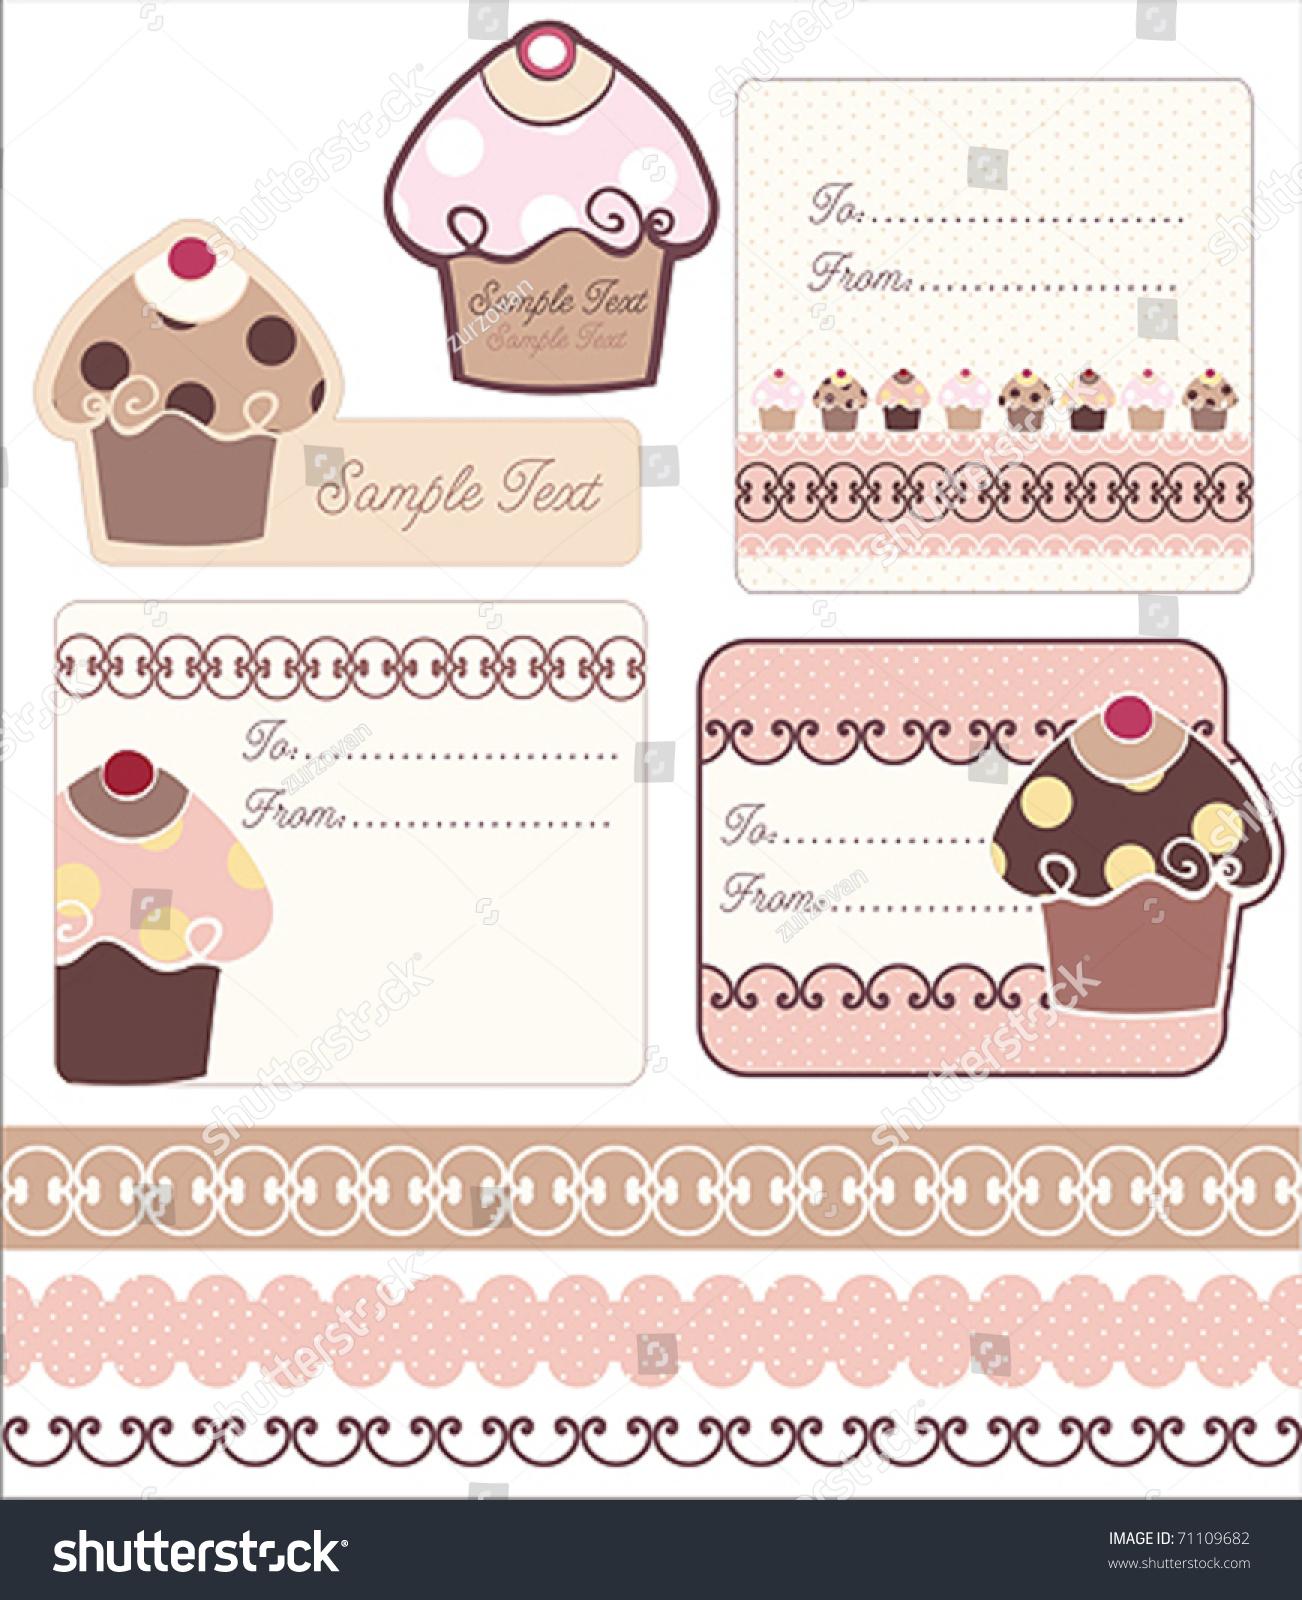 Sweet tag borders designs cupcake stock vector 71109682 shutterstock sweet tag borders designs with cupcake sciox Choice Image